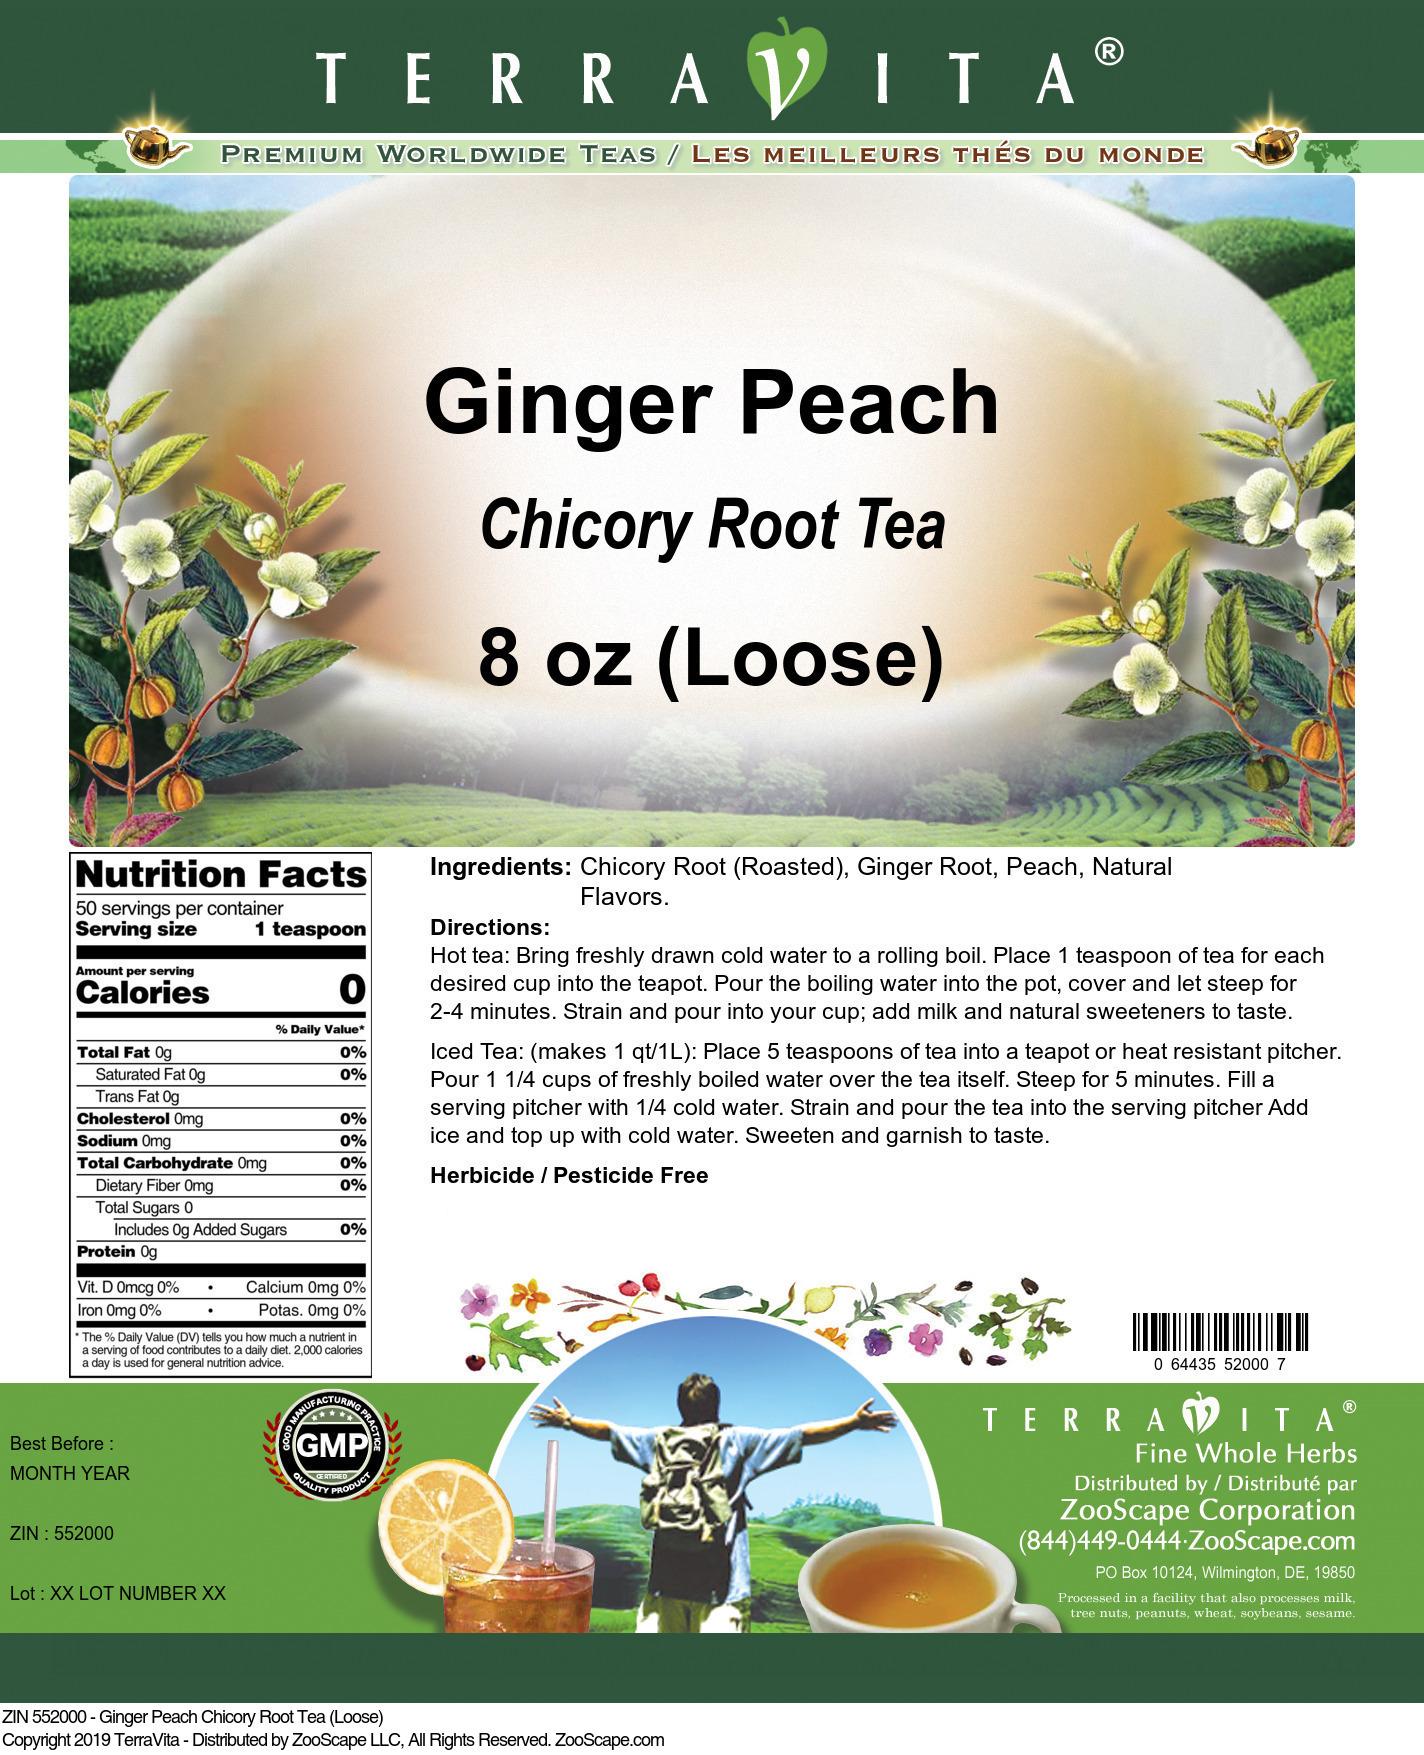 Ginger Peach Chicory Root